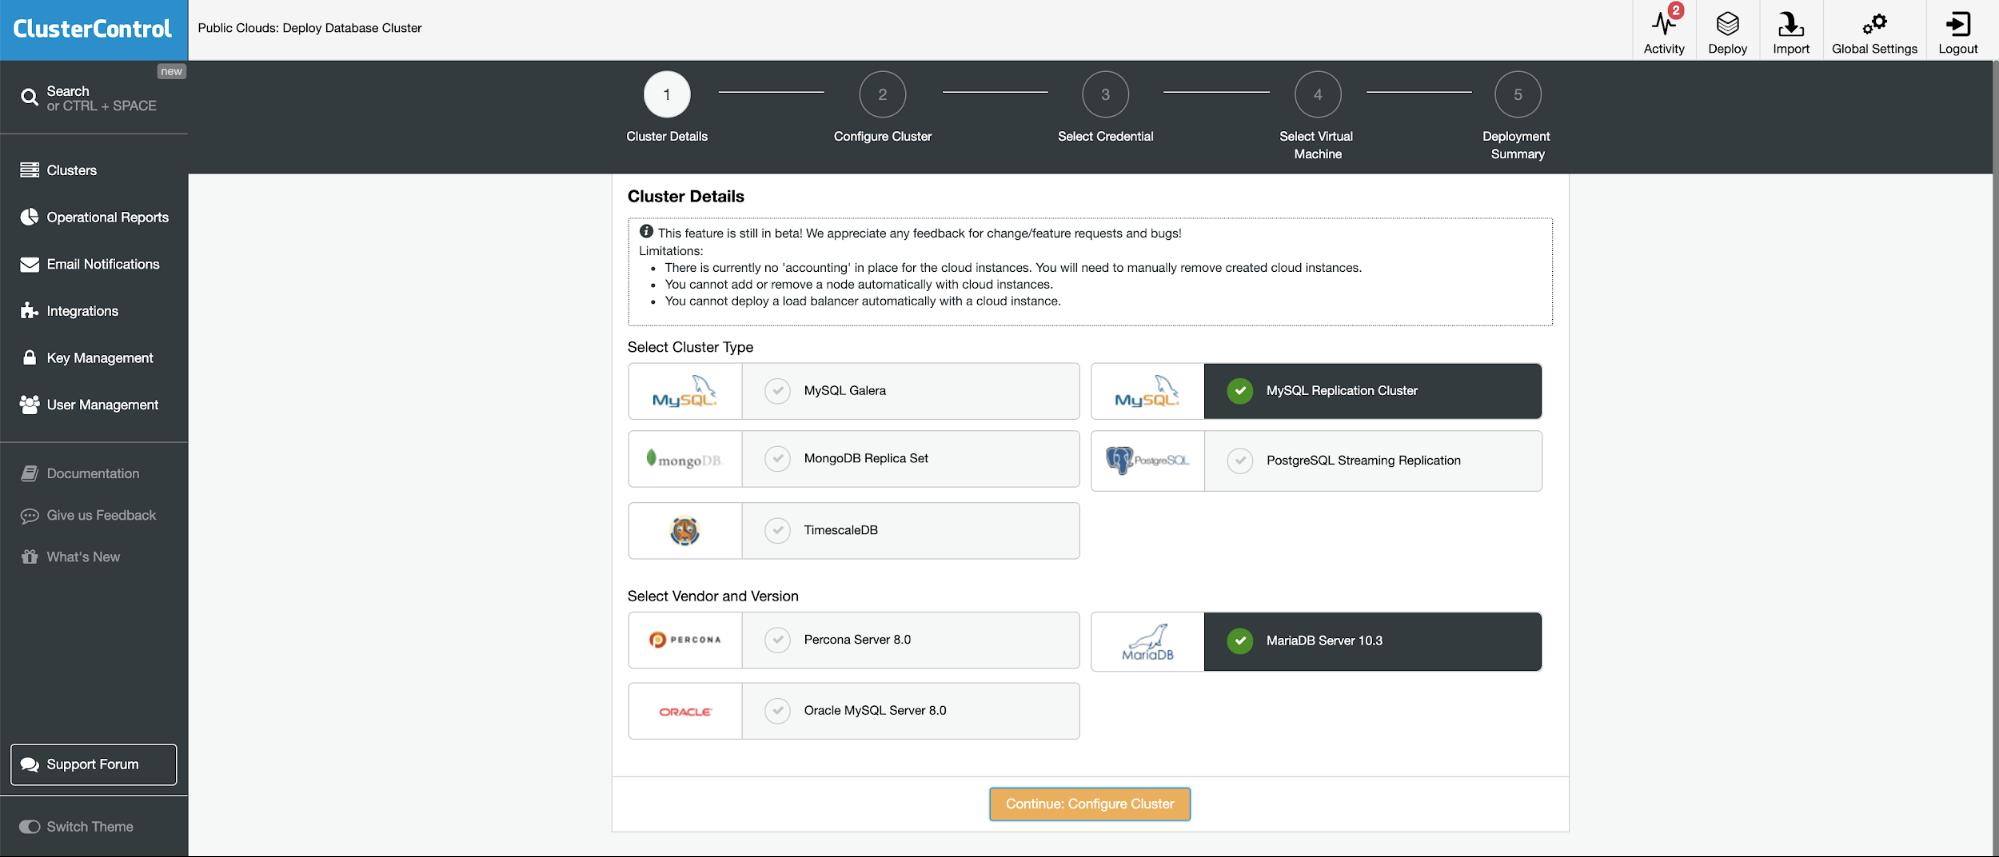 ClusterControl - Deploy MySQL Replication Cluster